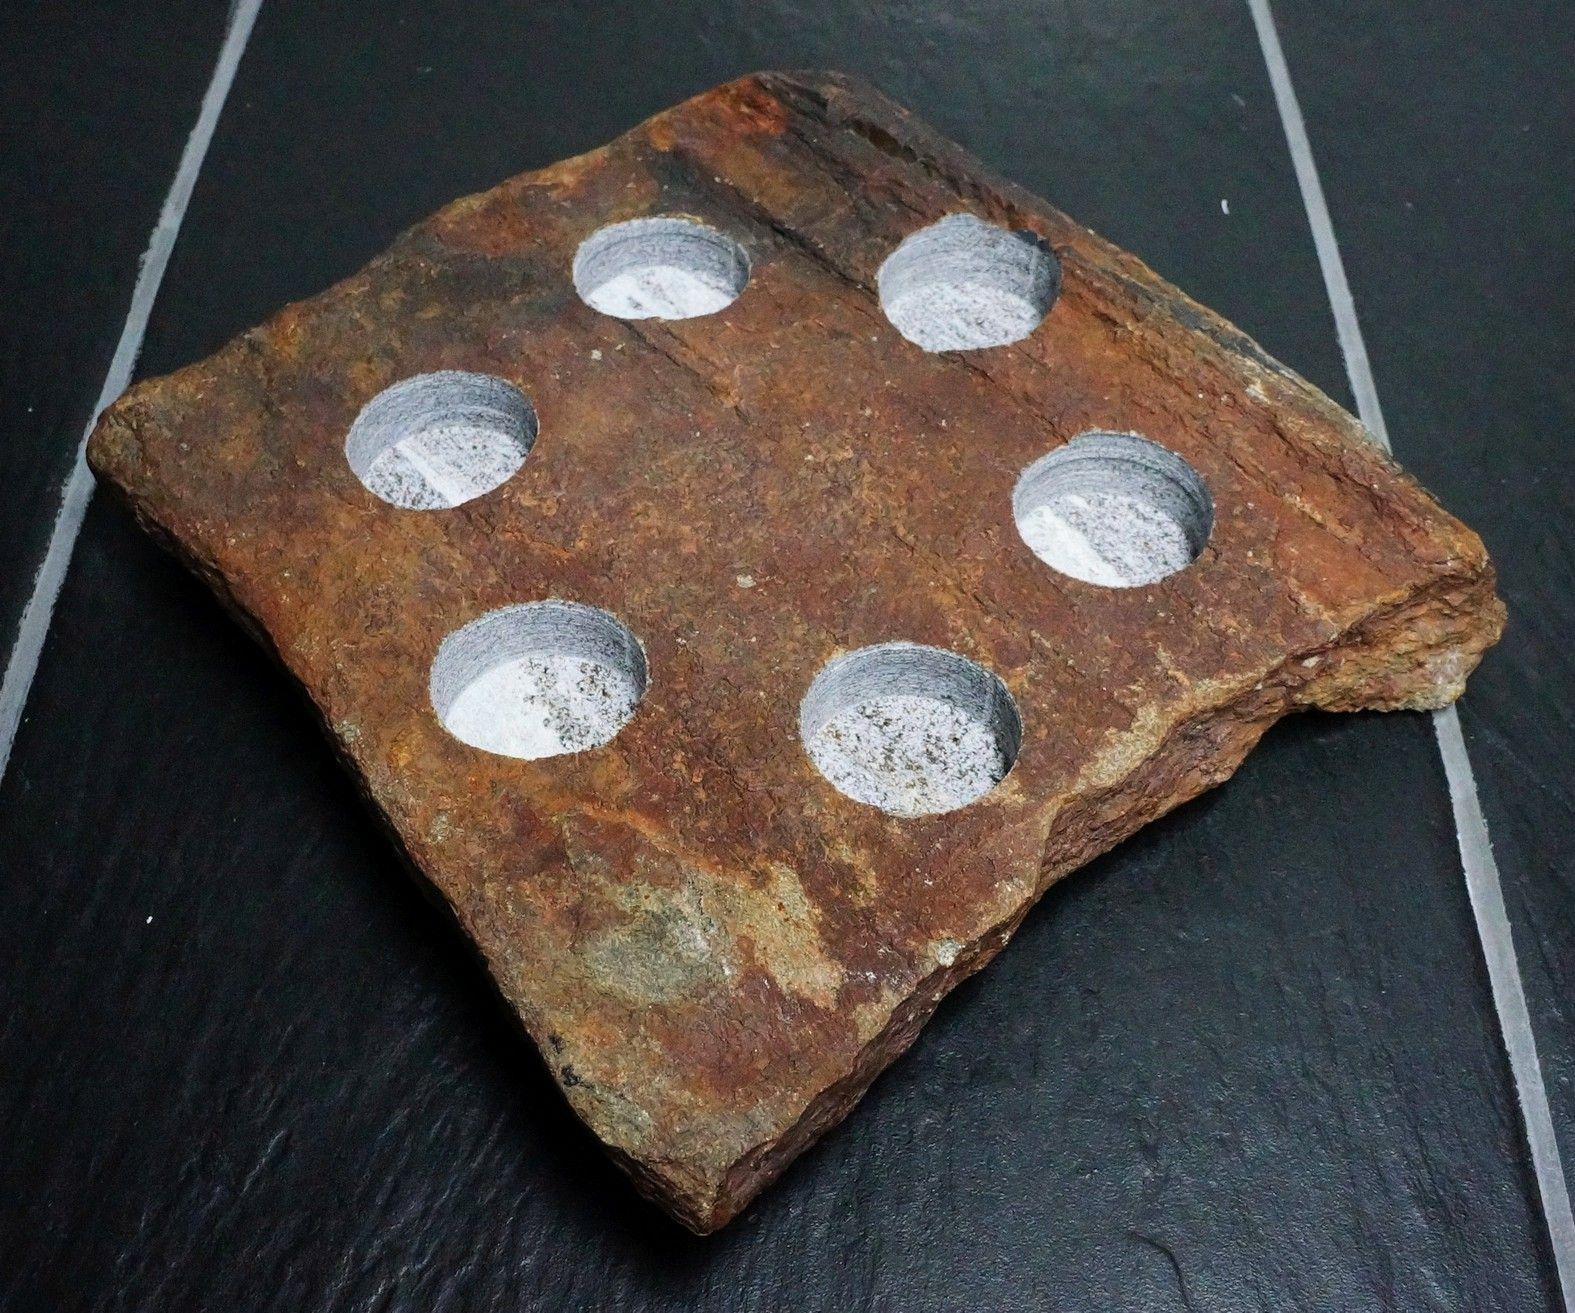 CNC milling stone